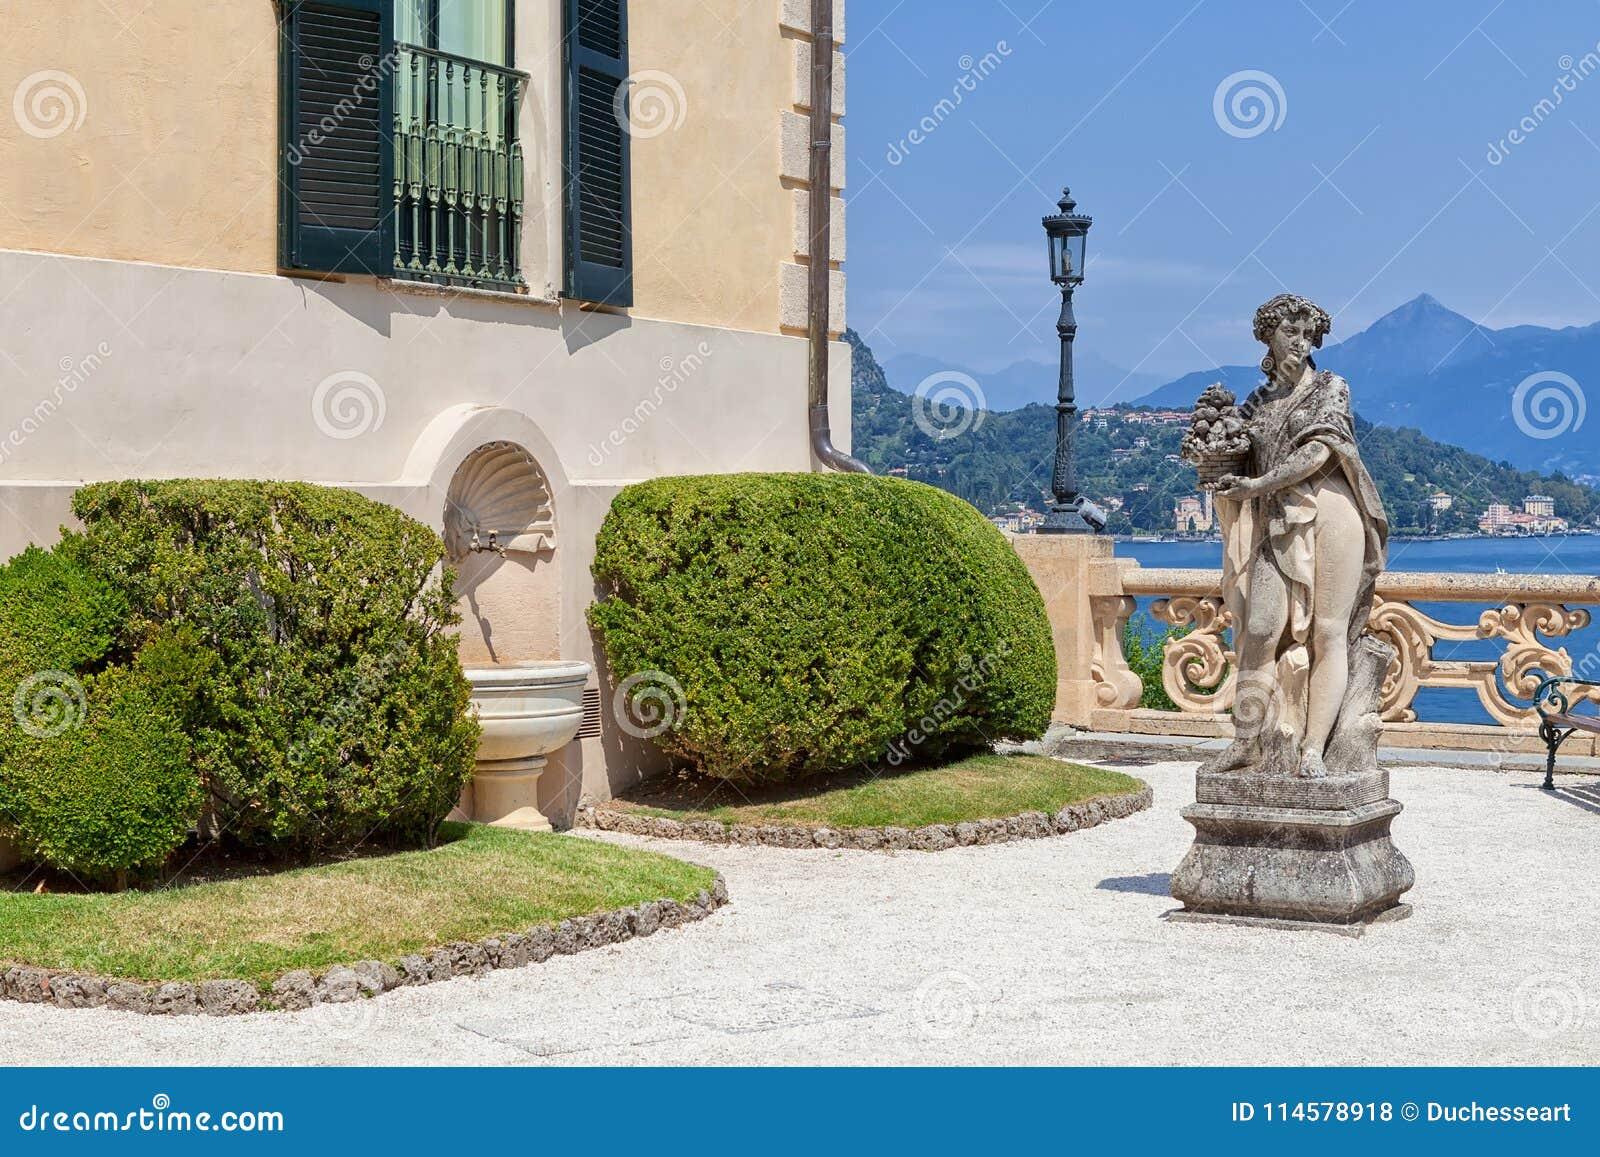 Kamienna statua w parku Willa Del Balbianello, Lenno, Lombardia, Włochy